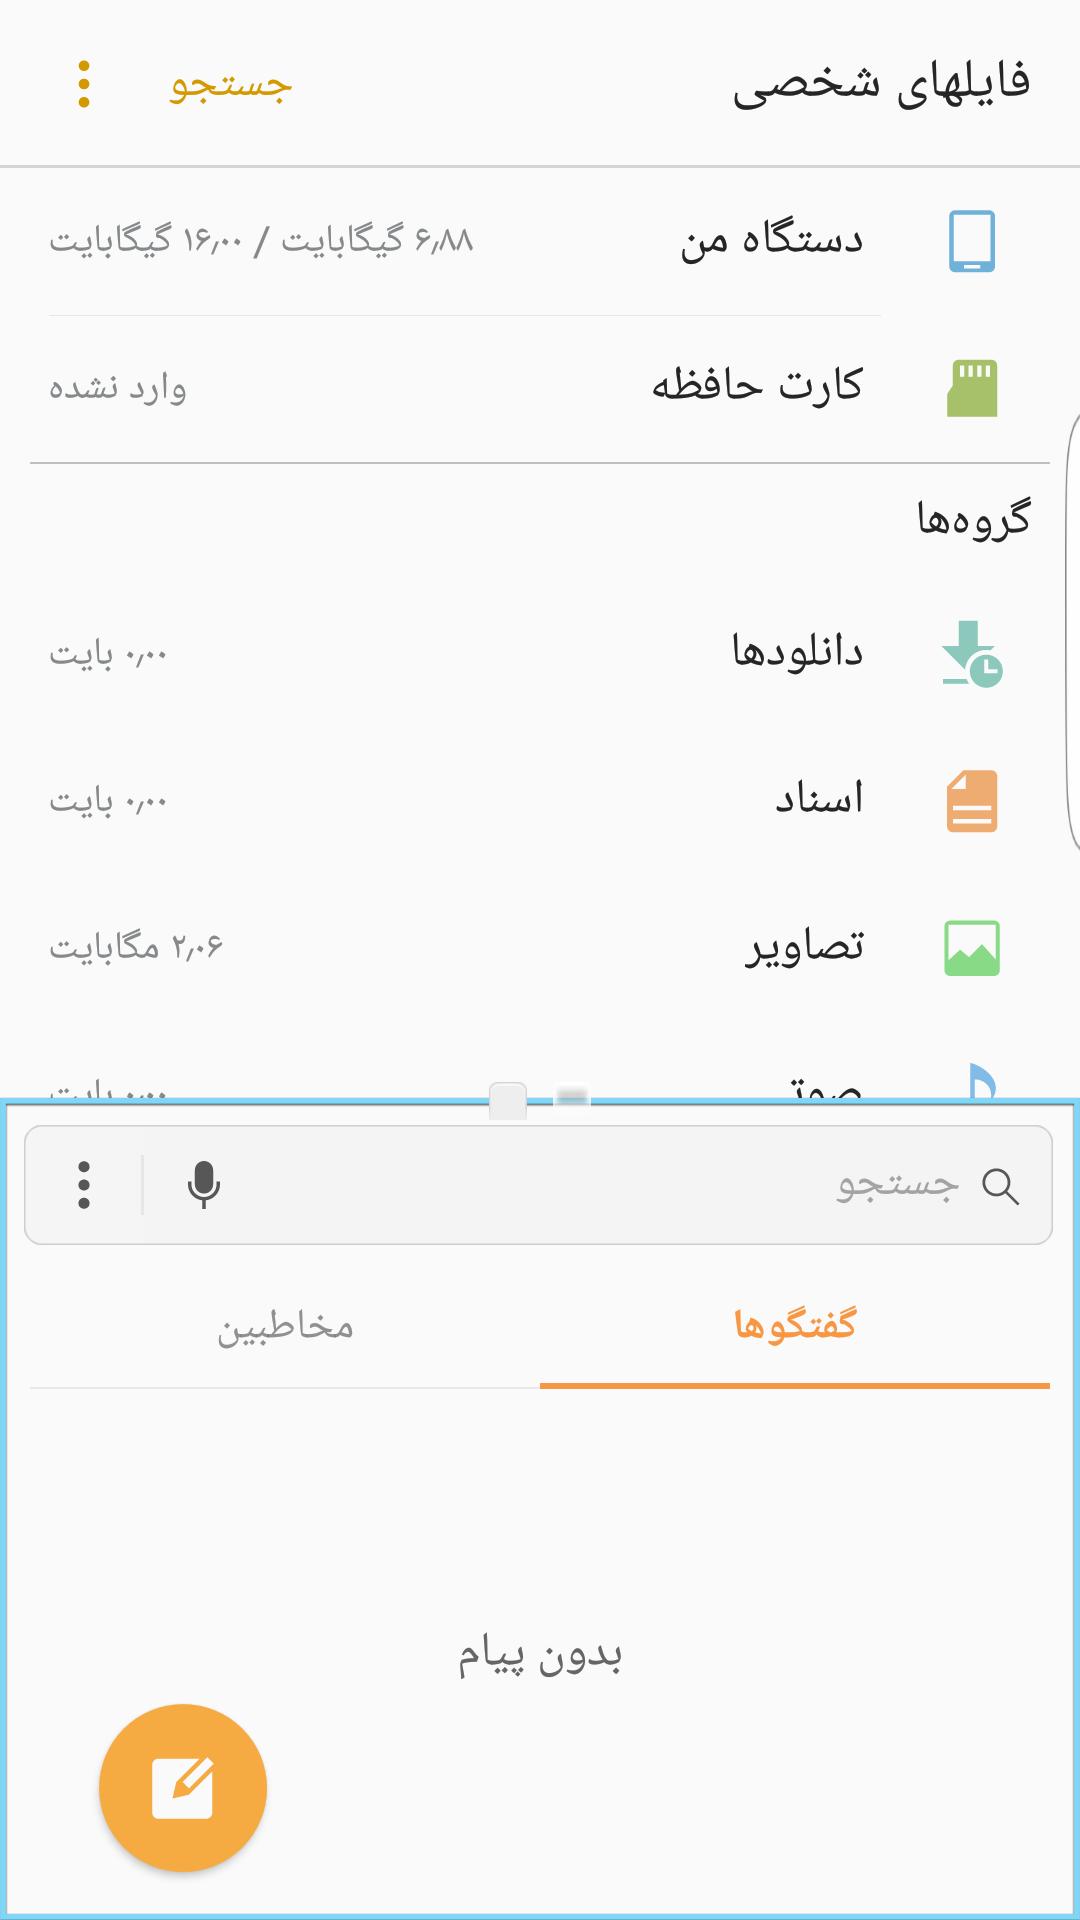 Screenshot_۲۰۱۷۰۳۰۵-۱۱۴۳۳۳